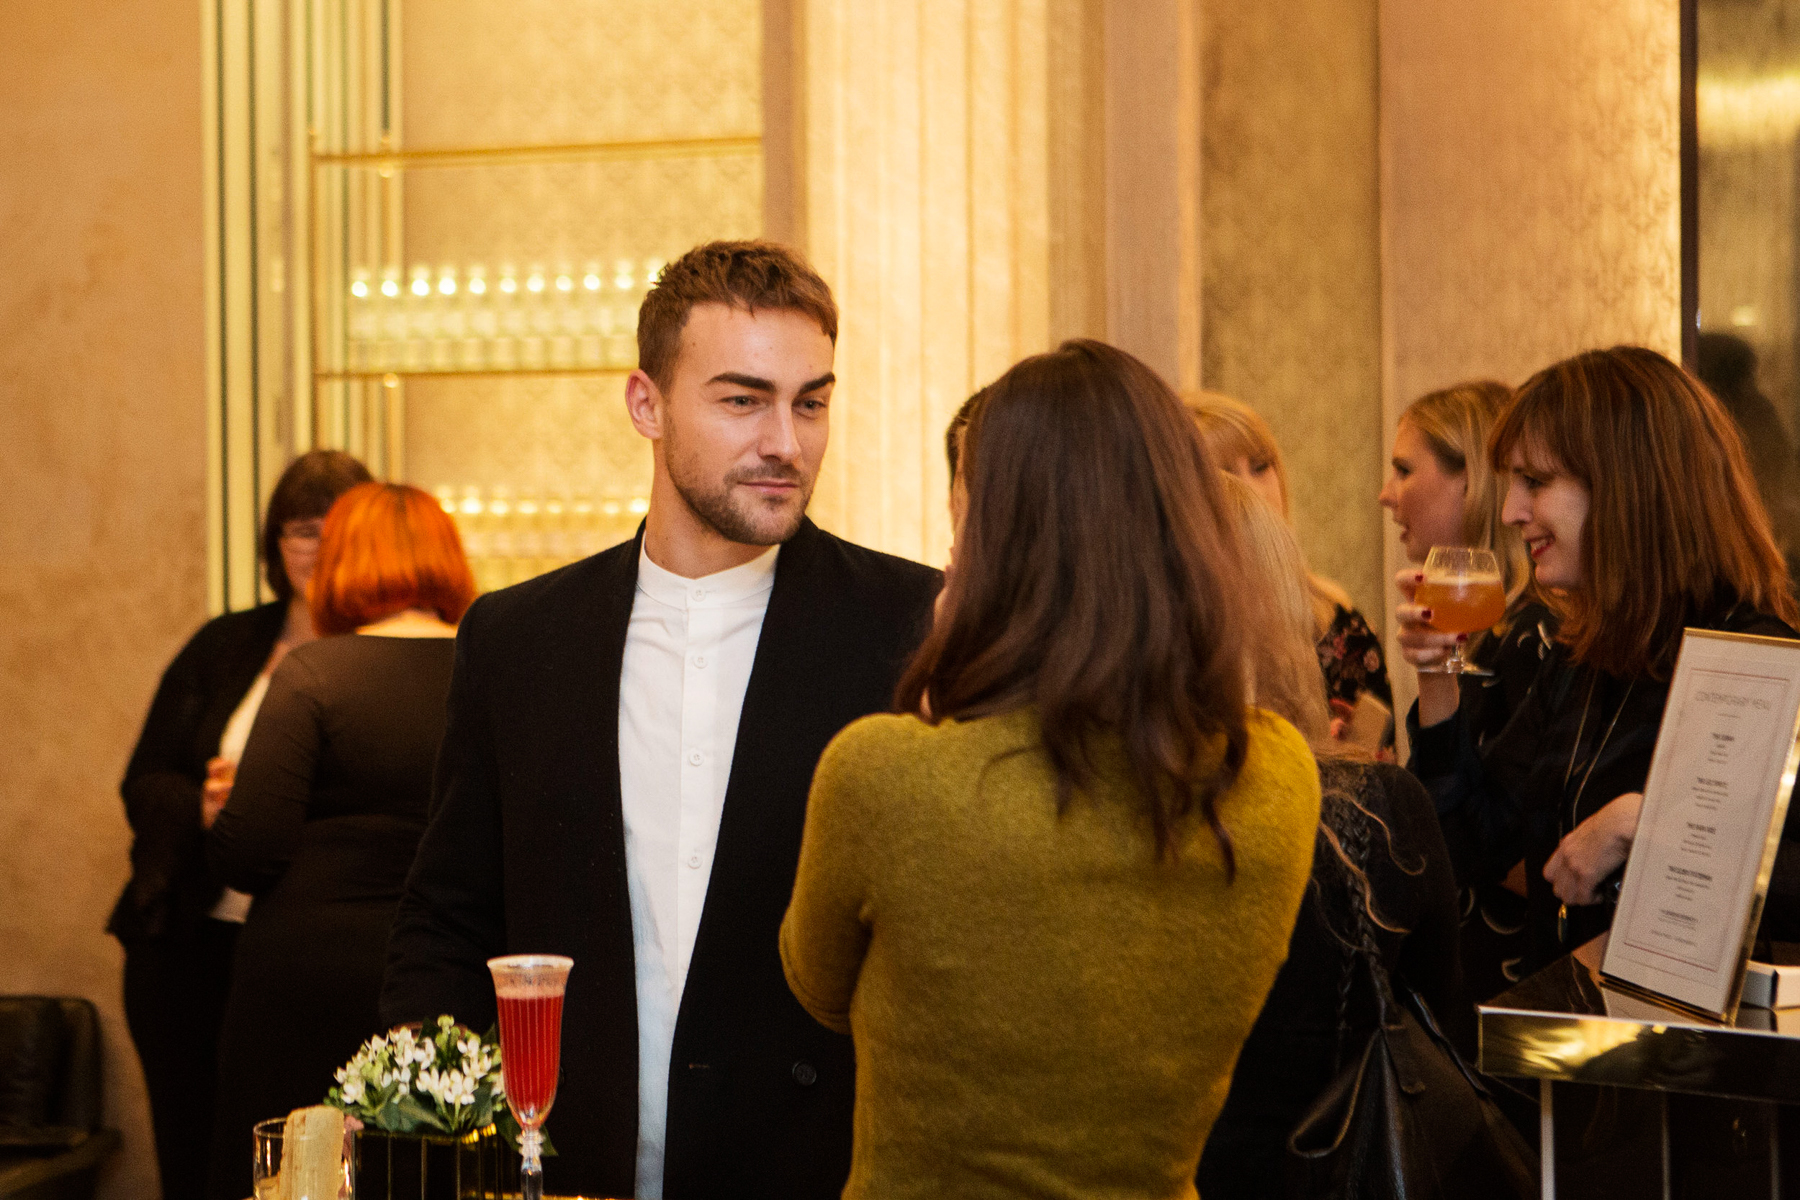 Raccoon London - Corporate Event Photographer - Andreas - May 2018  44.jpg